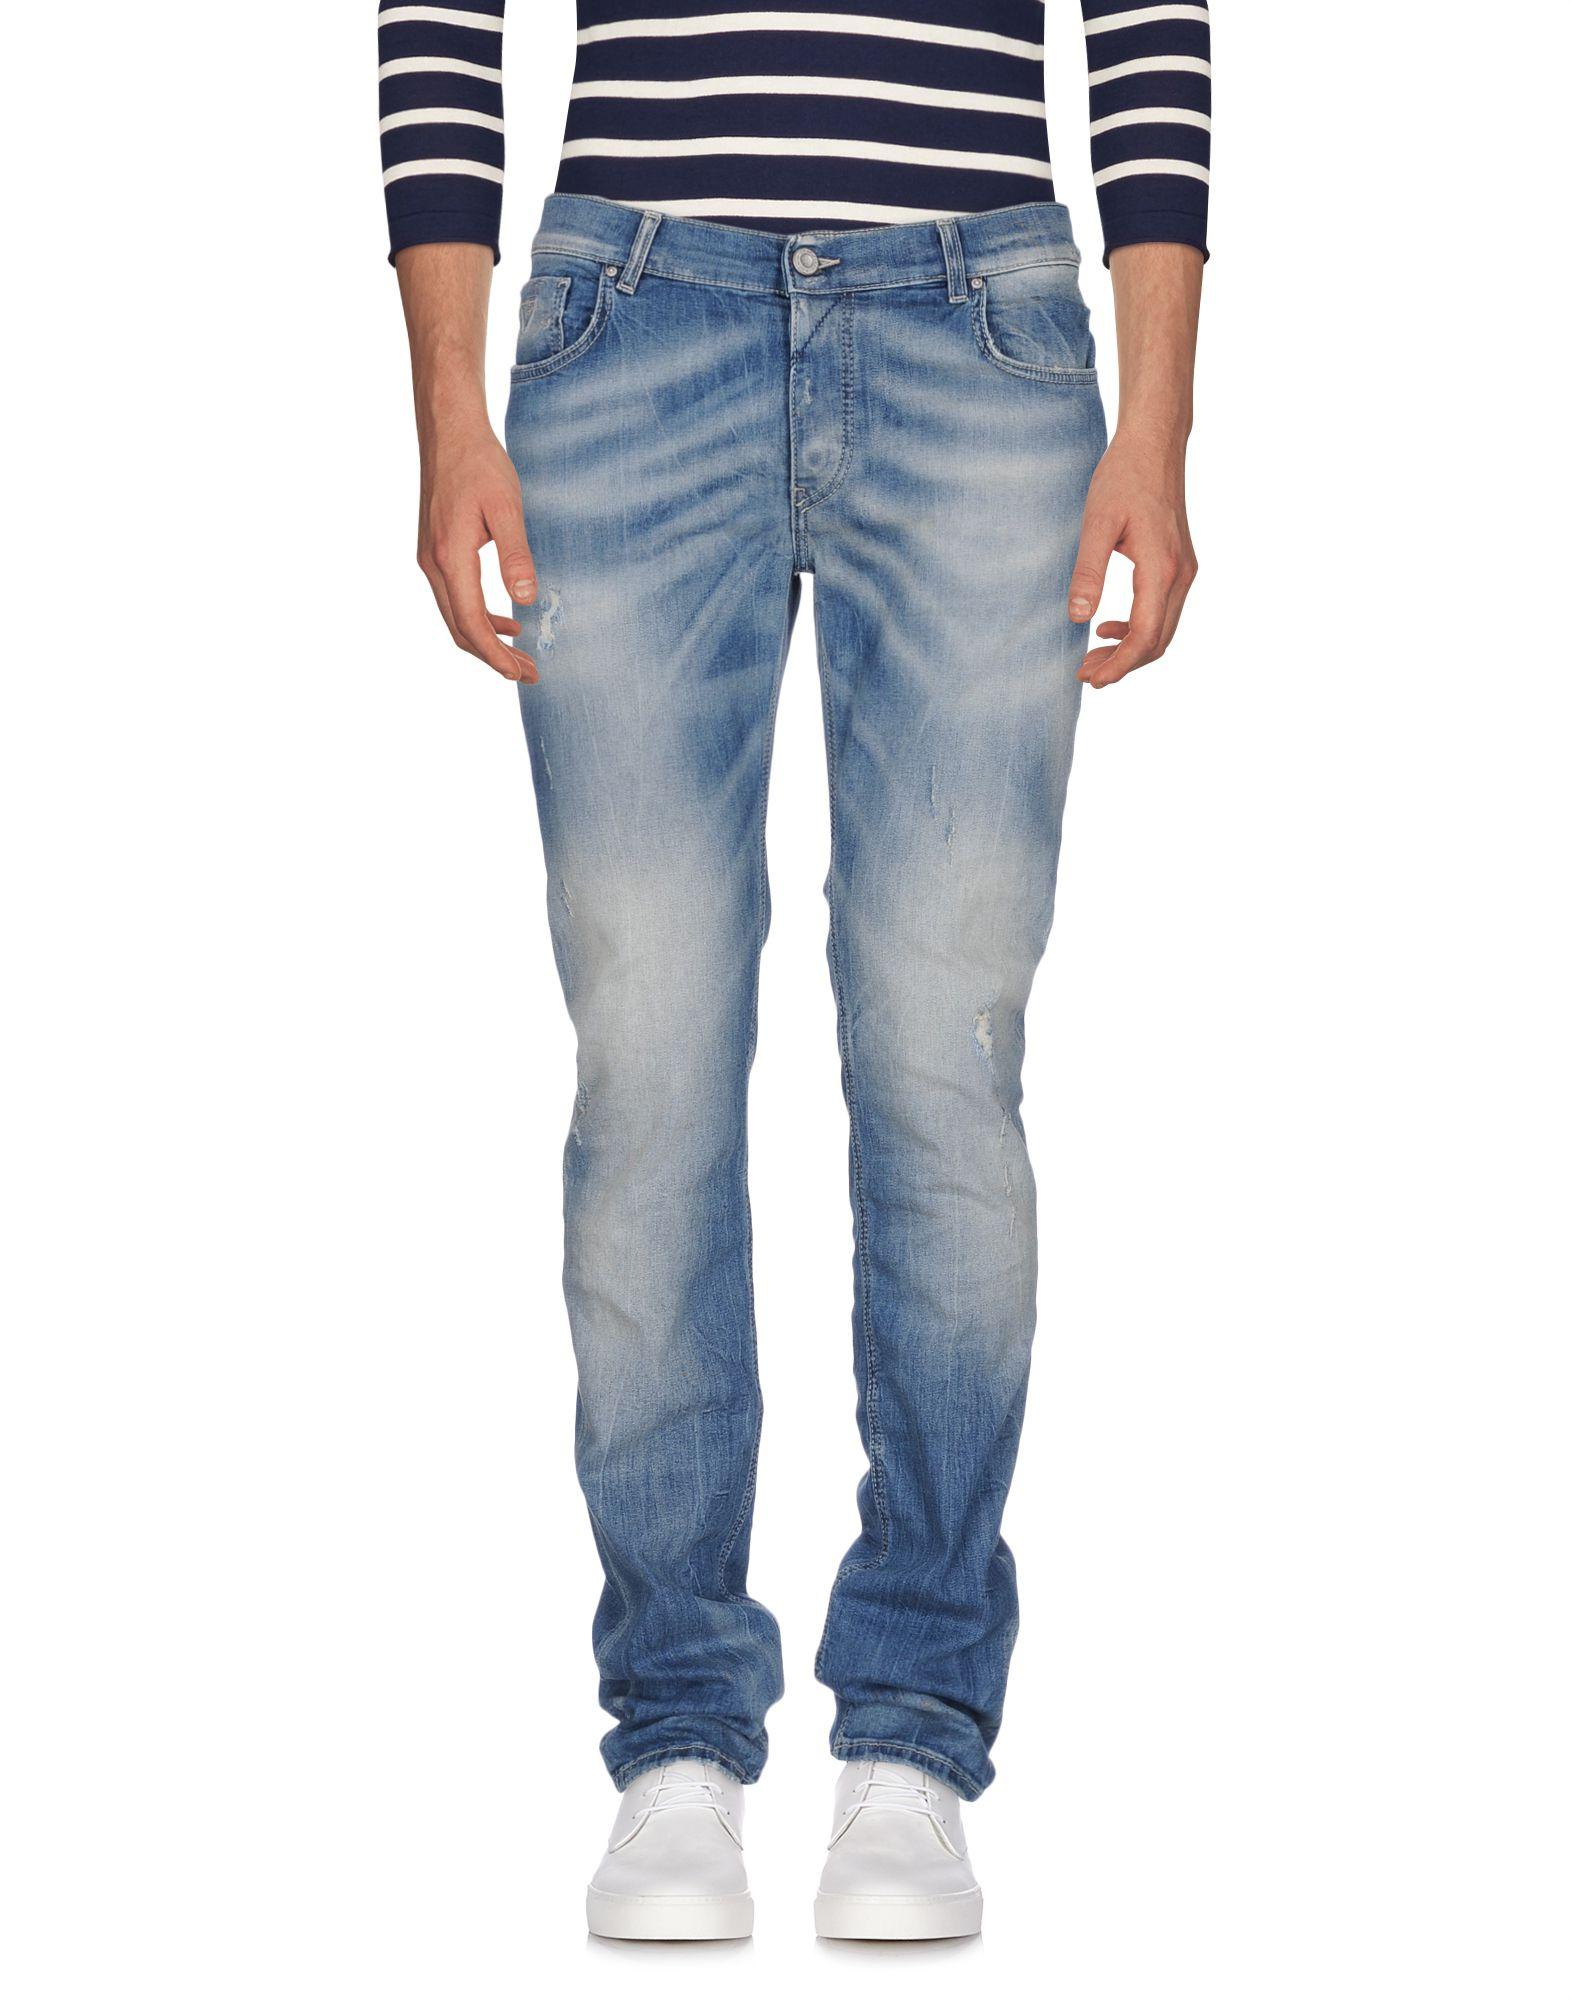 Pantaloni Pantaloni Pantaloni Jeans Fifty Four Uomo - 42624069XC e351af